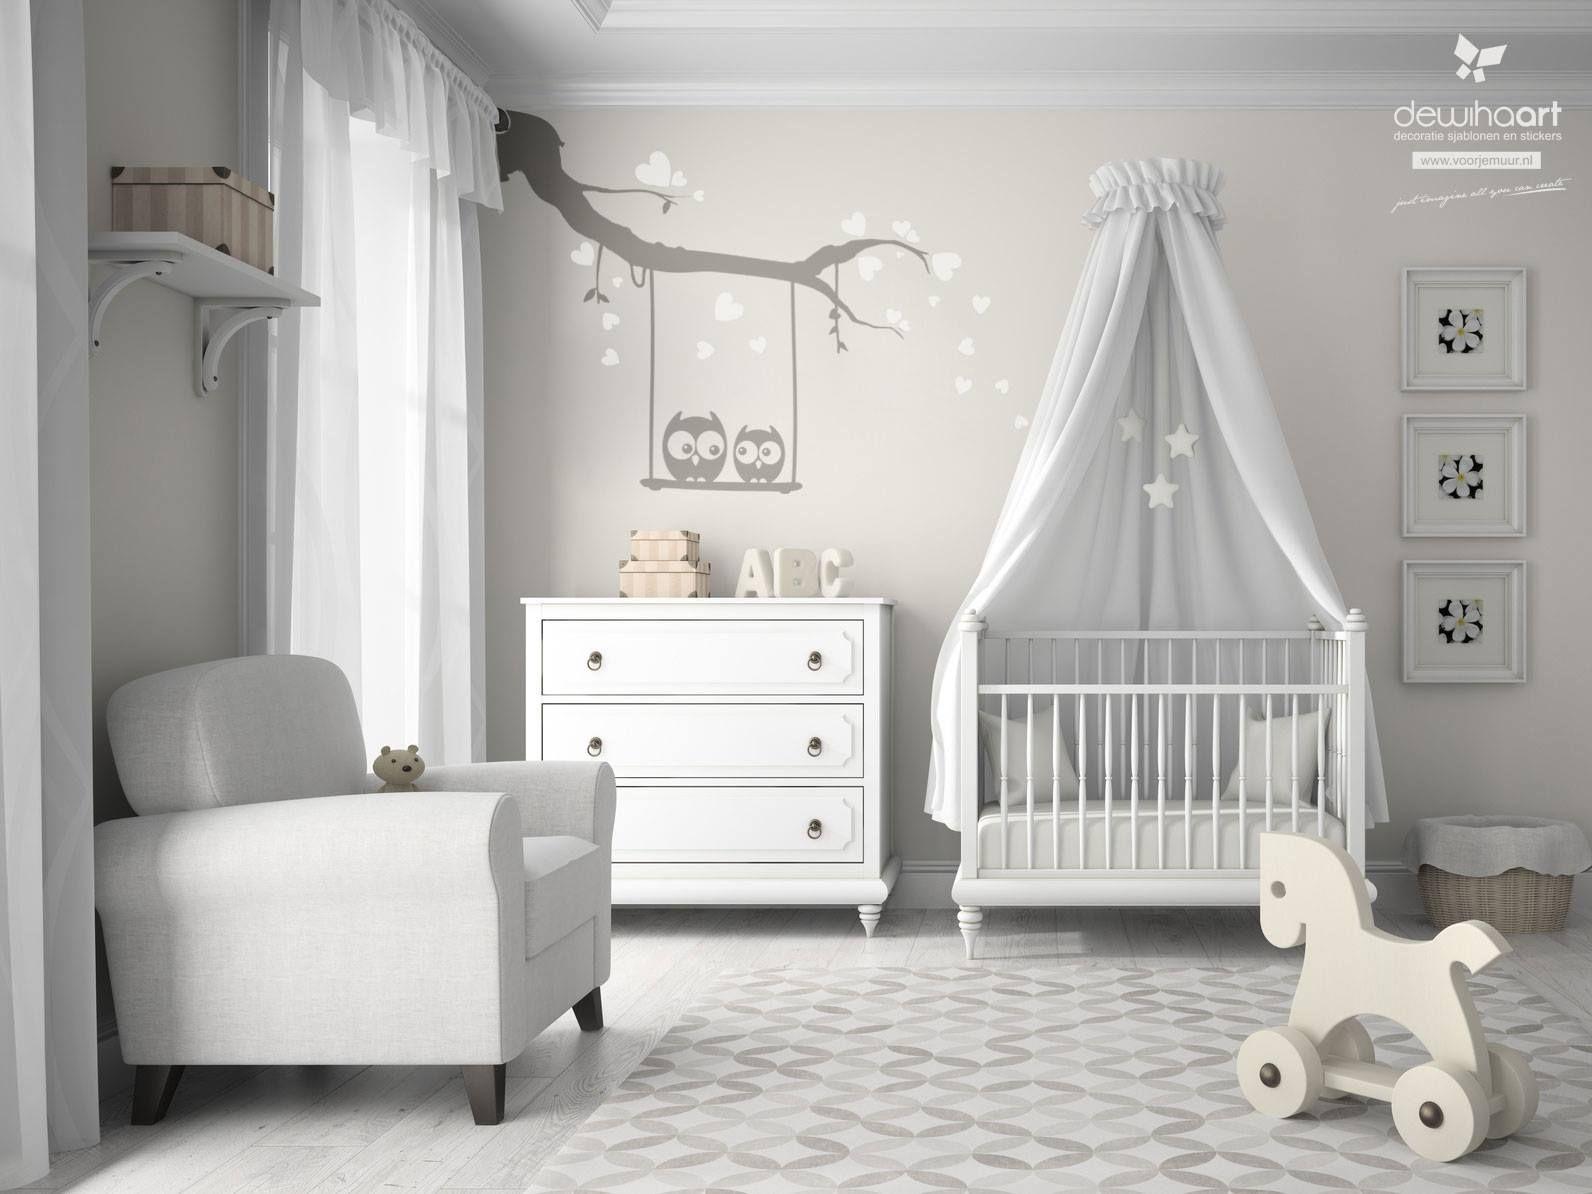 Leuke Babykamer Muurstickers : Leuke muursticker tak met uiltjes barn met